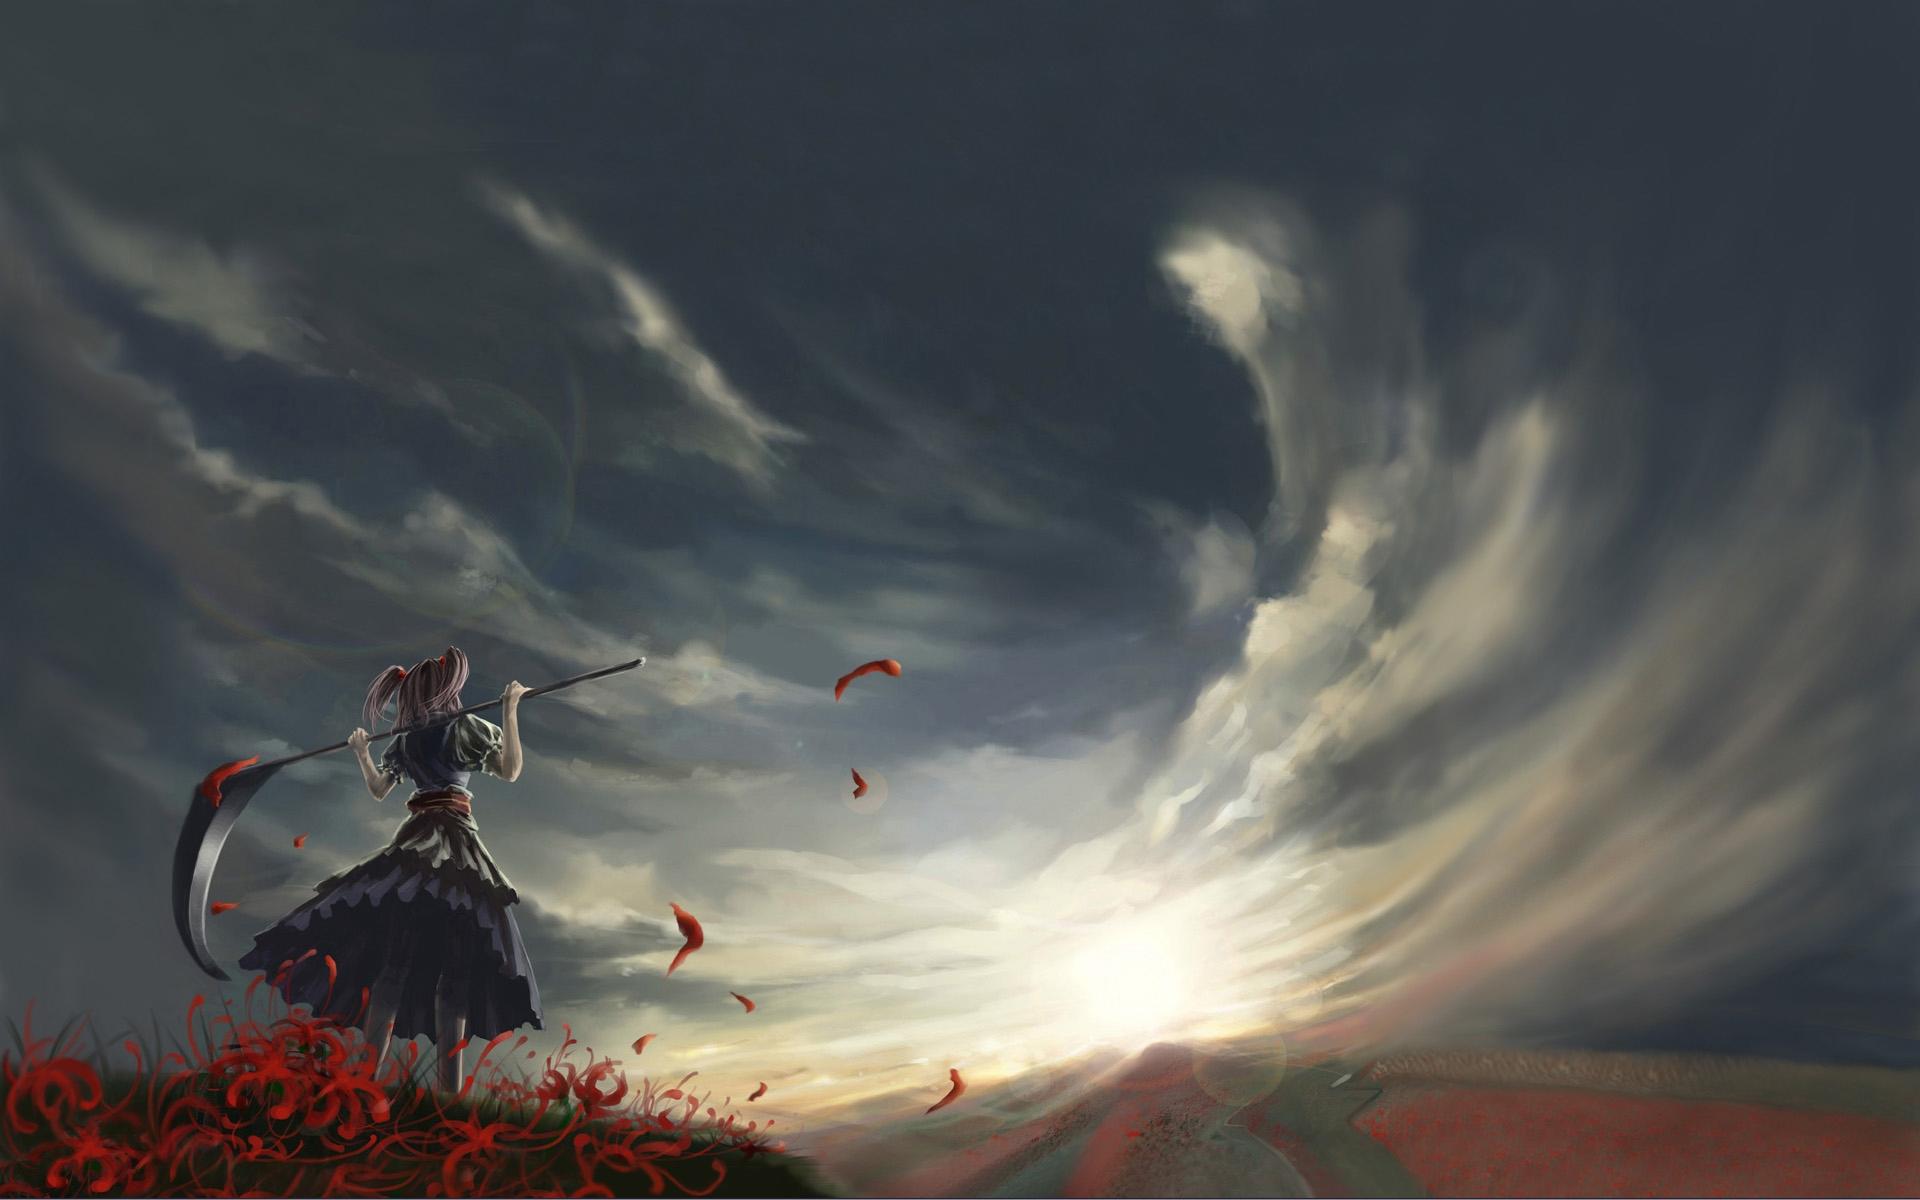 100 Amazing Anime/Manga Digital Art - Anime, wallpaperCoolvibe